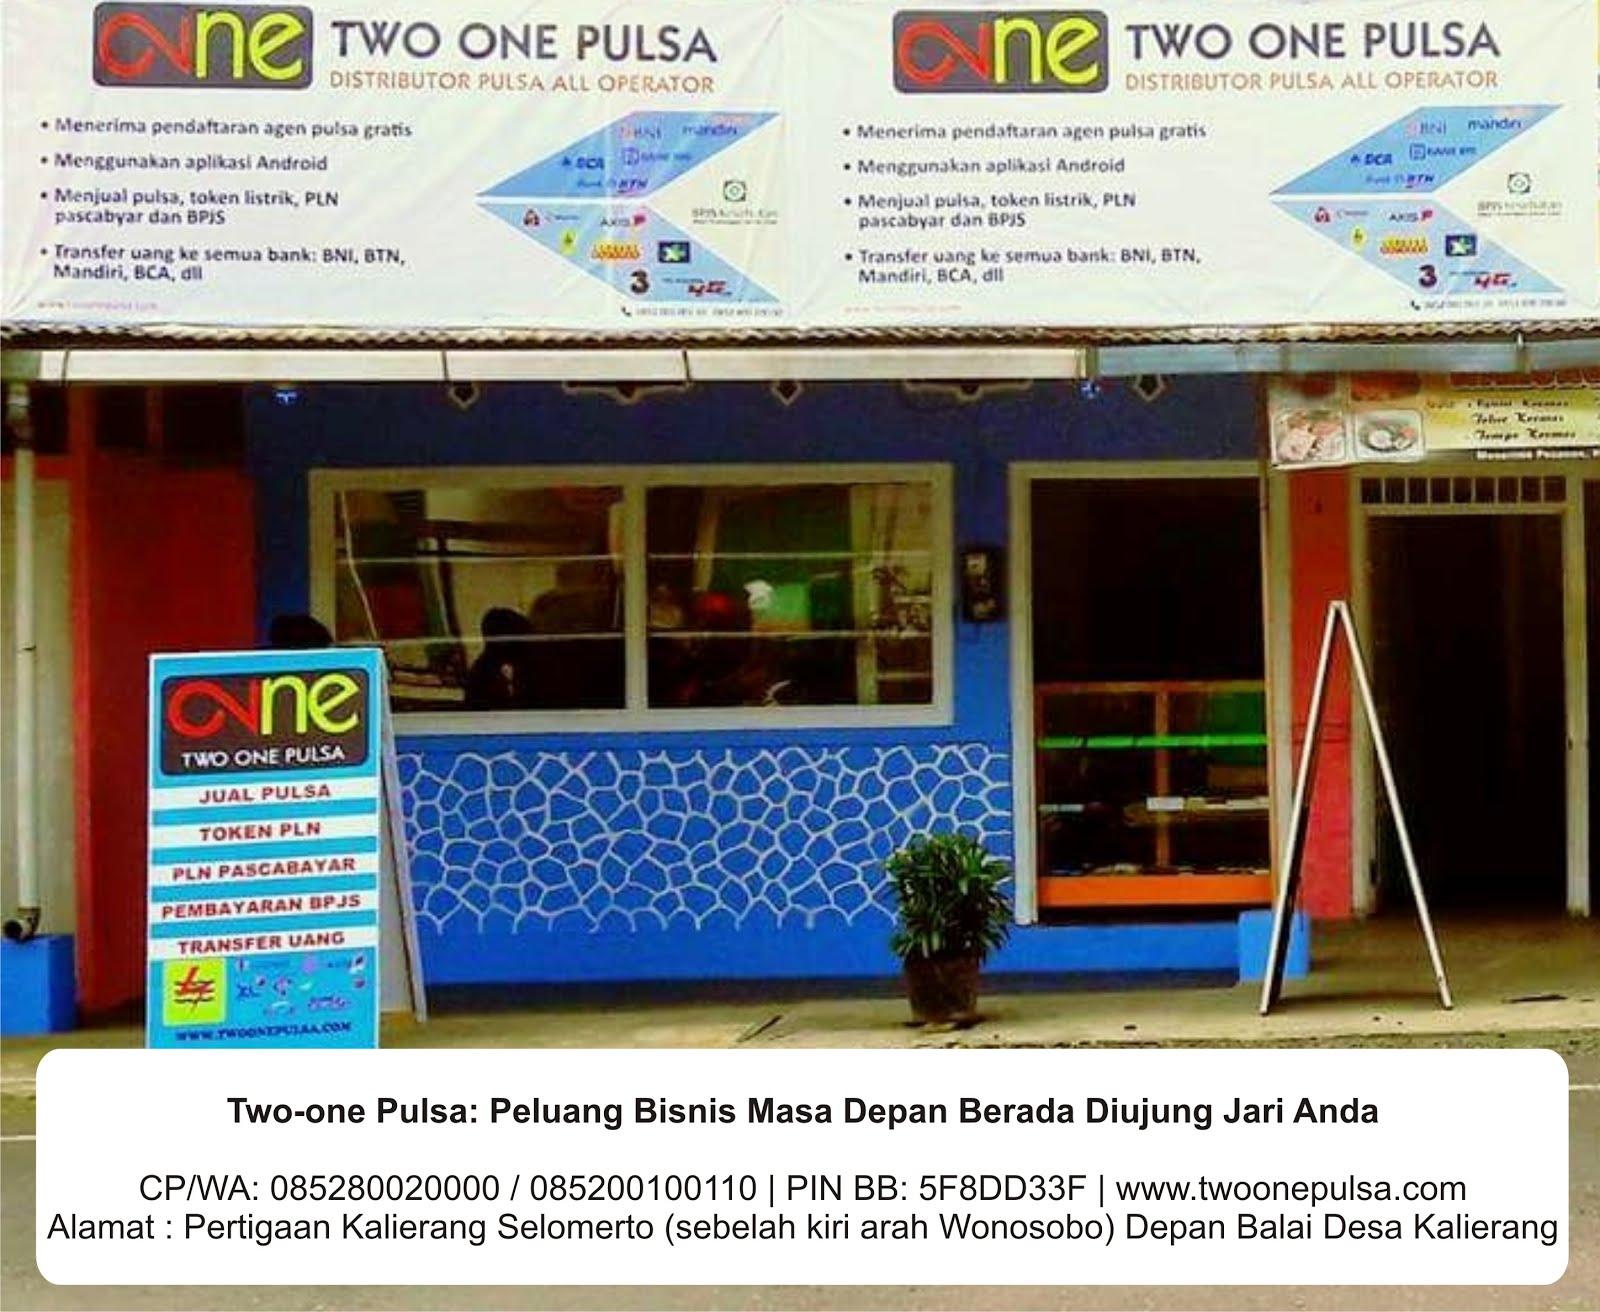 Two-One Pulsa Kalierang Wonosobo